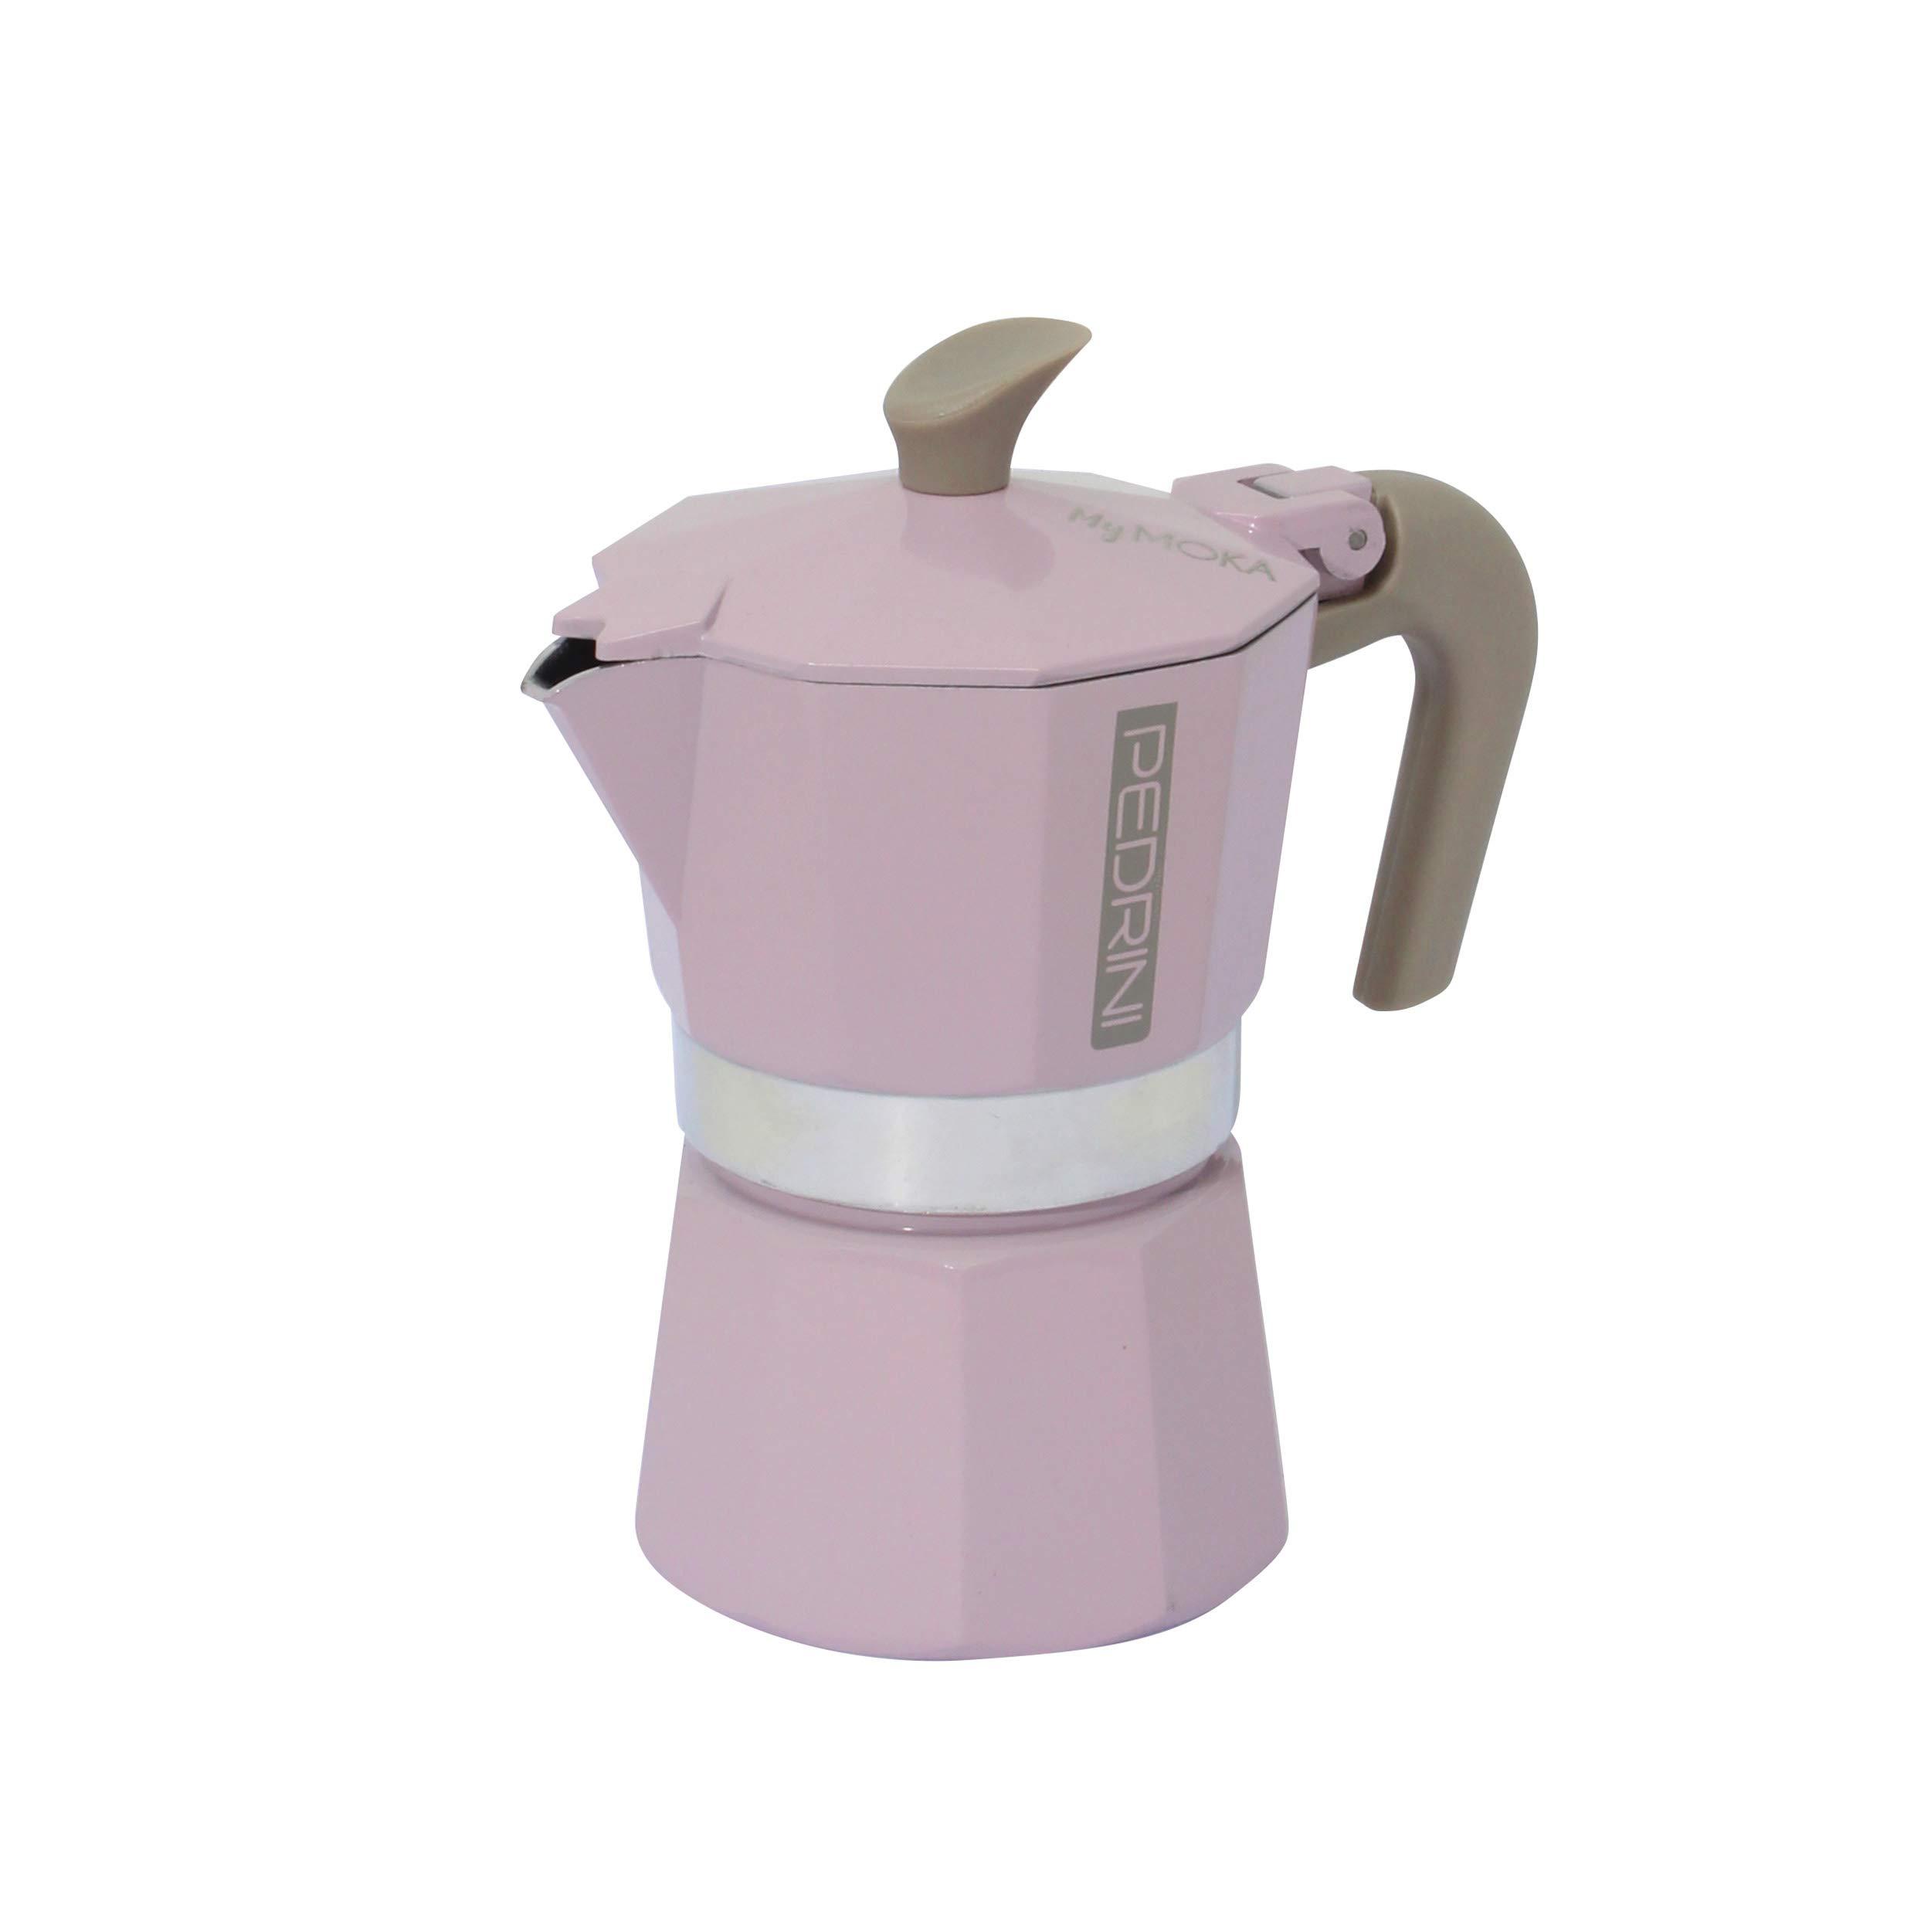 Pedrini Mymoka - Cafetera de aluminio 6 tazze Powder Pink: Amazon ...